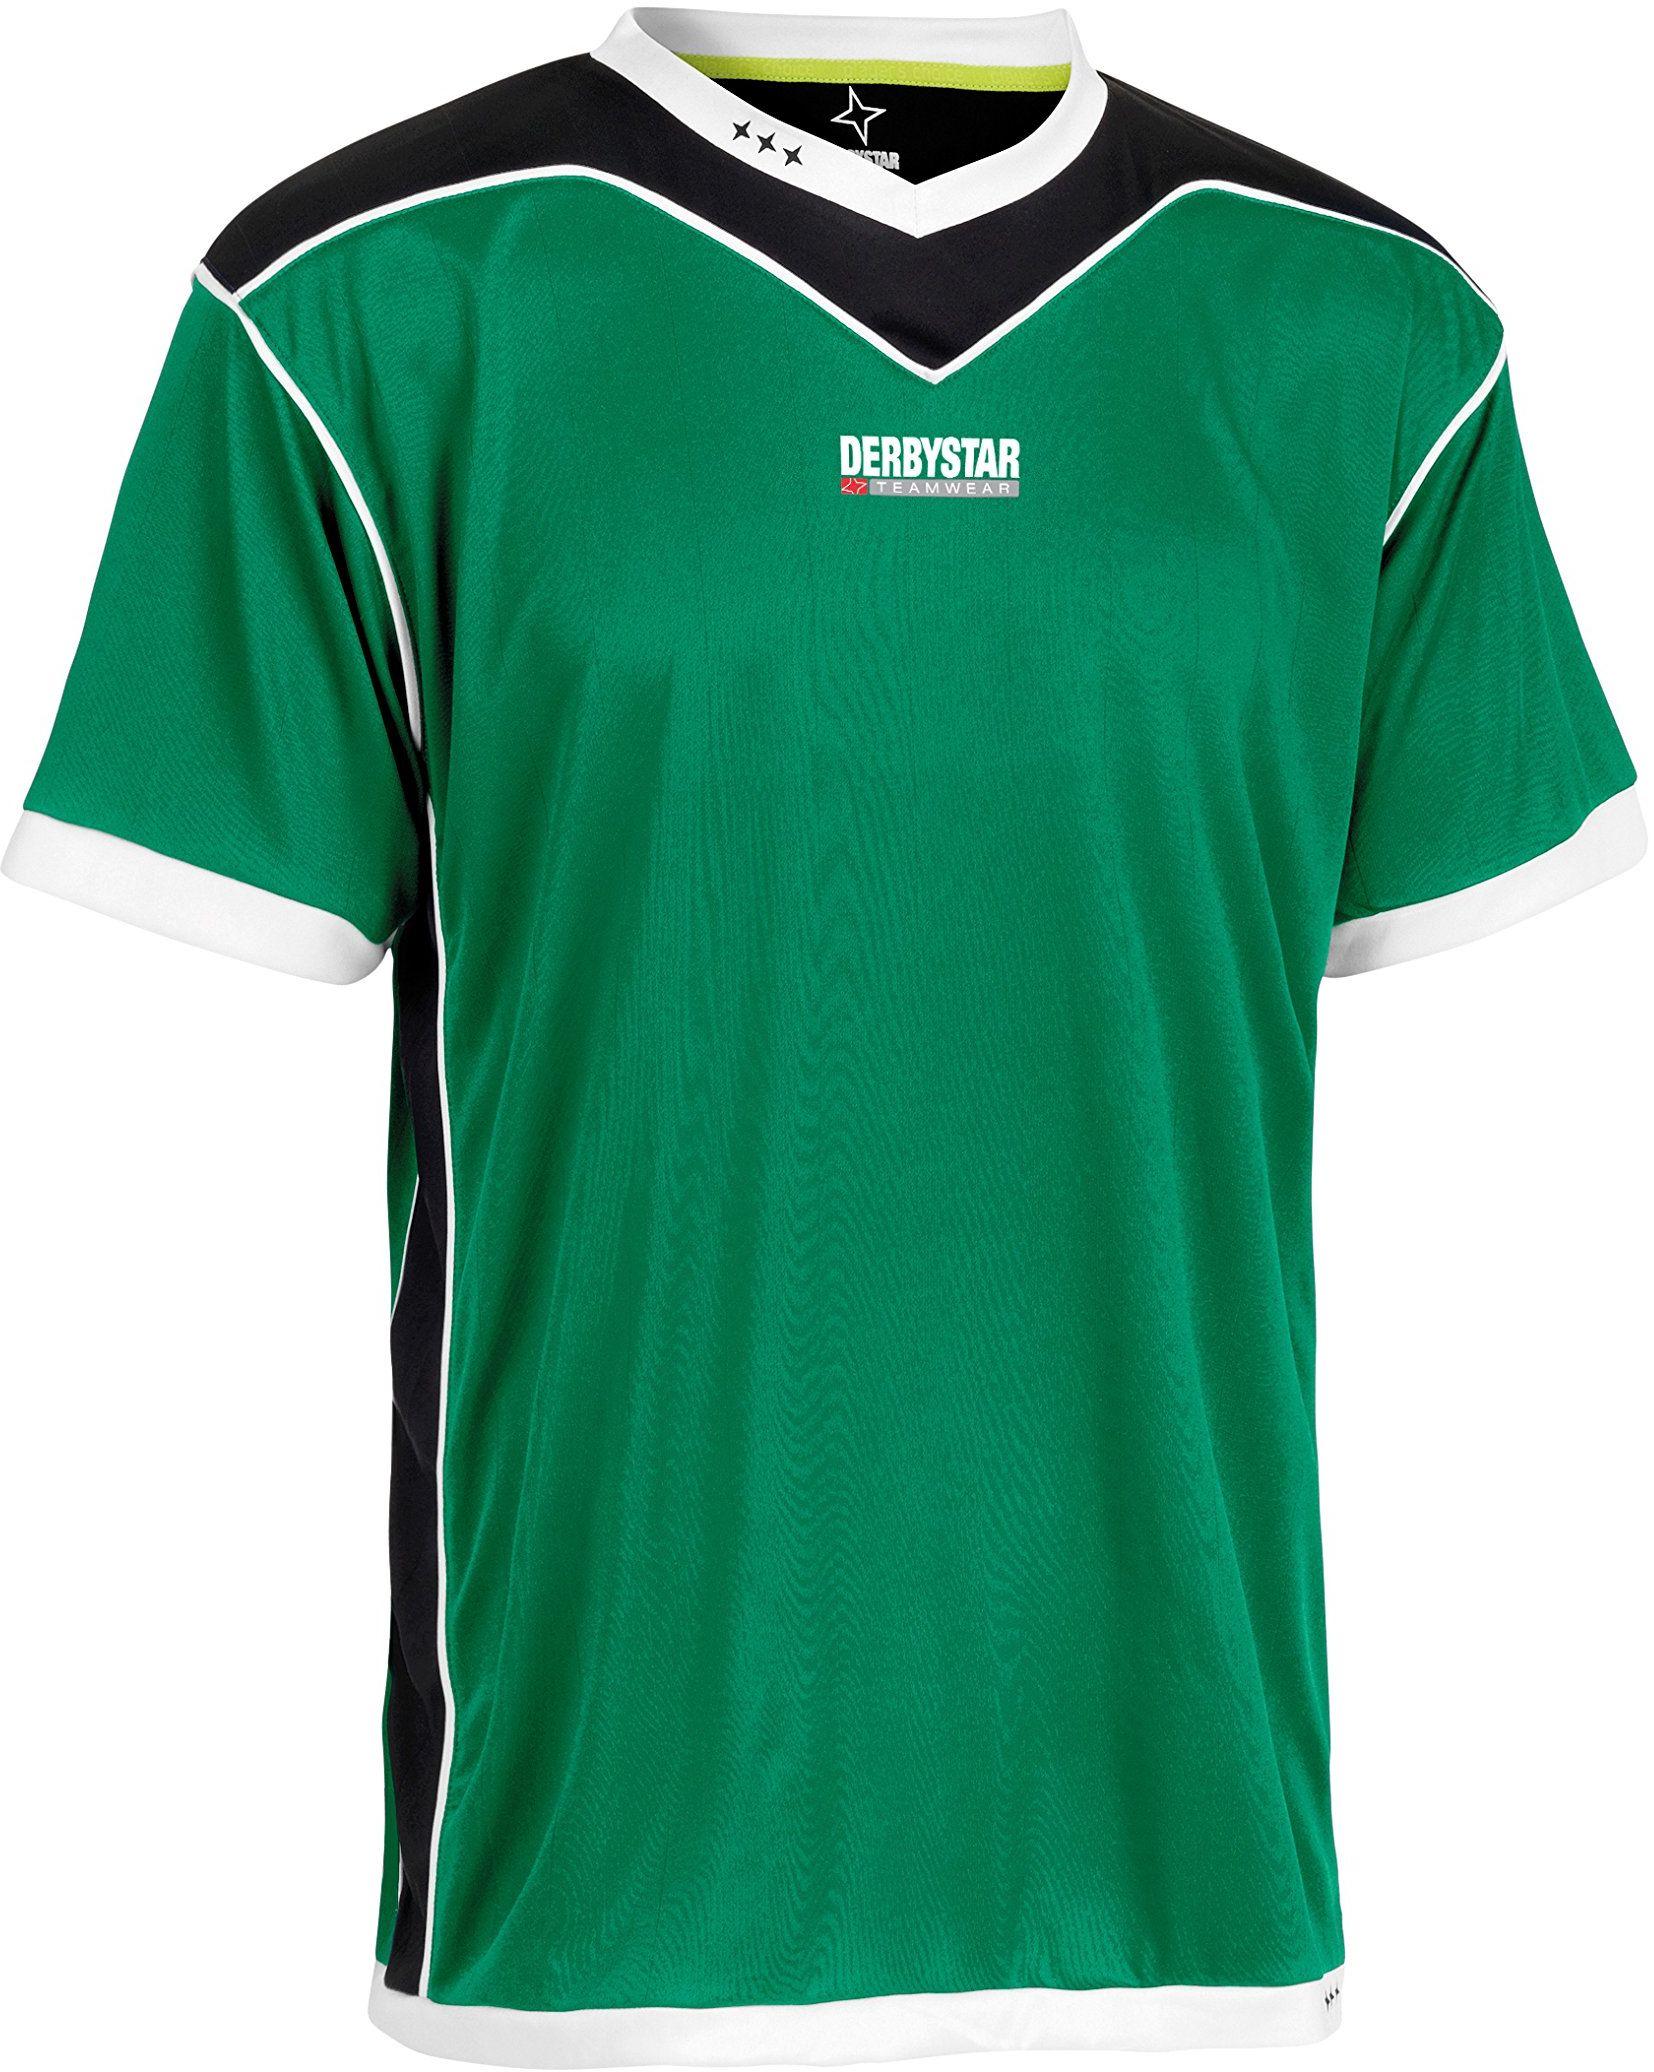 Derbystar Koszulka Brillant krótka, XXL, zielona czarna, 6000070420